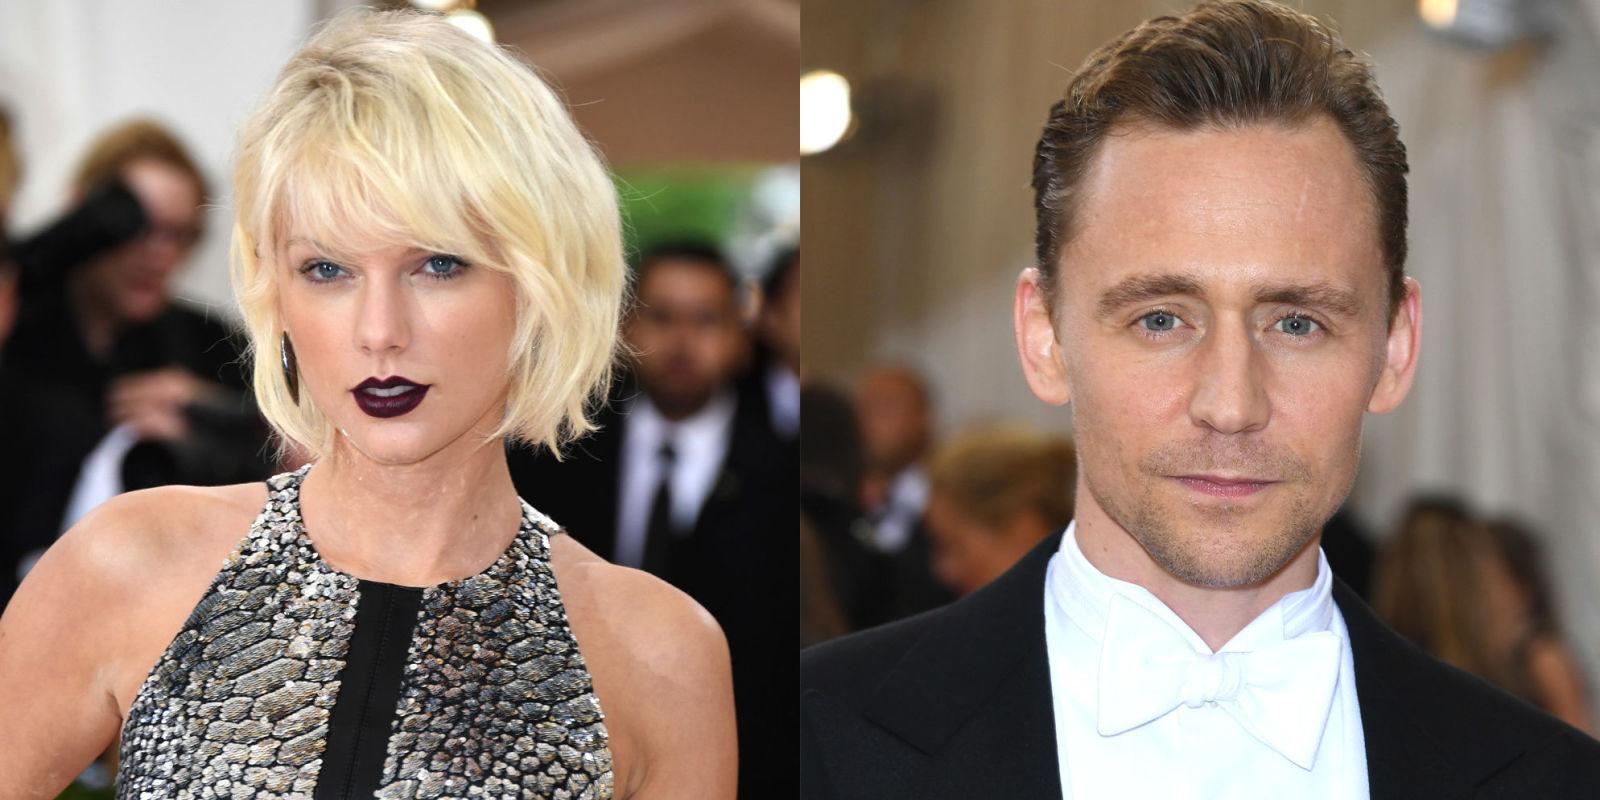 Taylor and Tom Hiddleston met gala